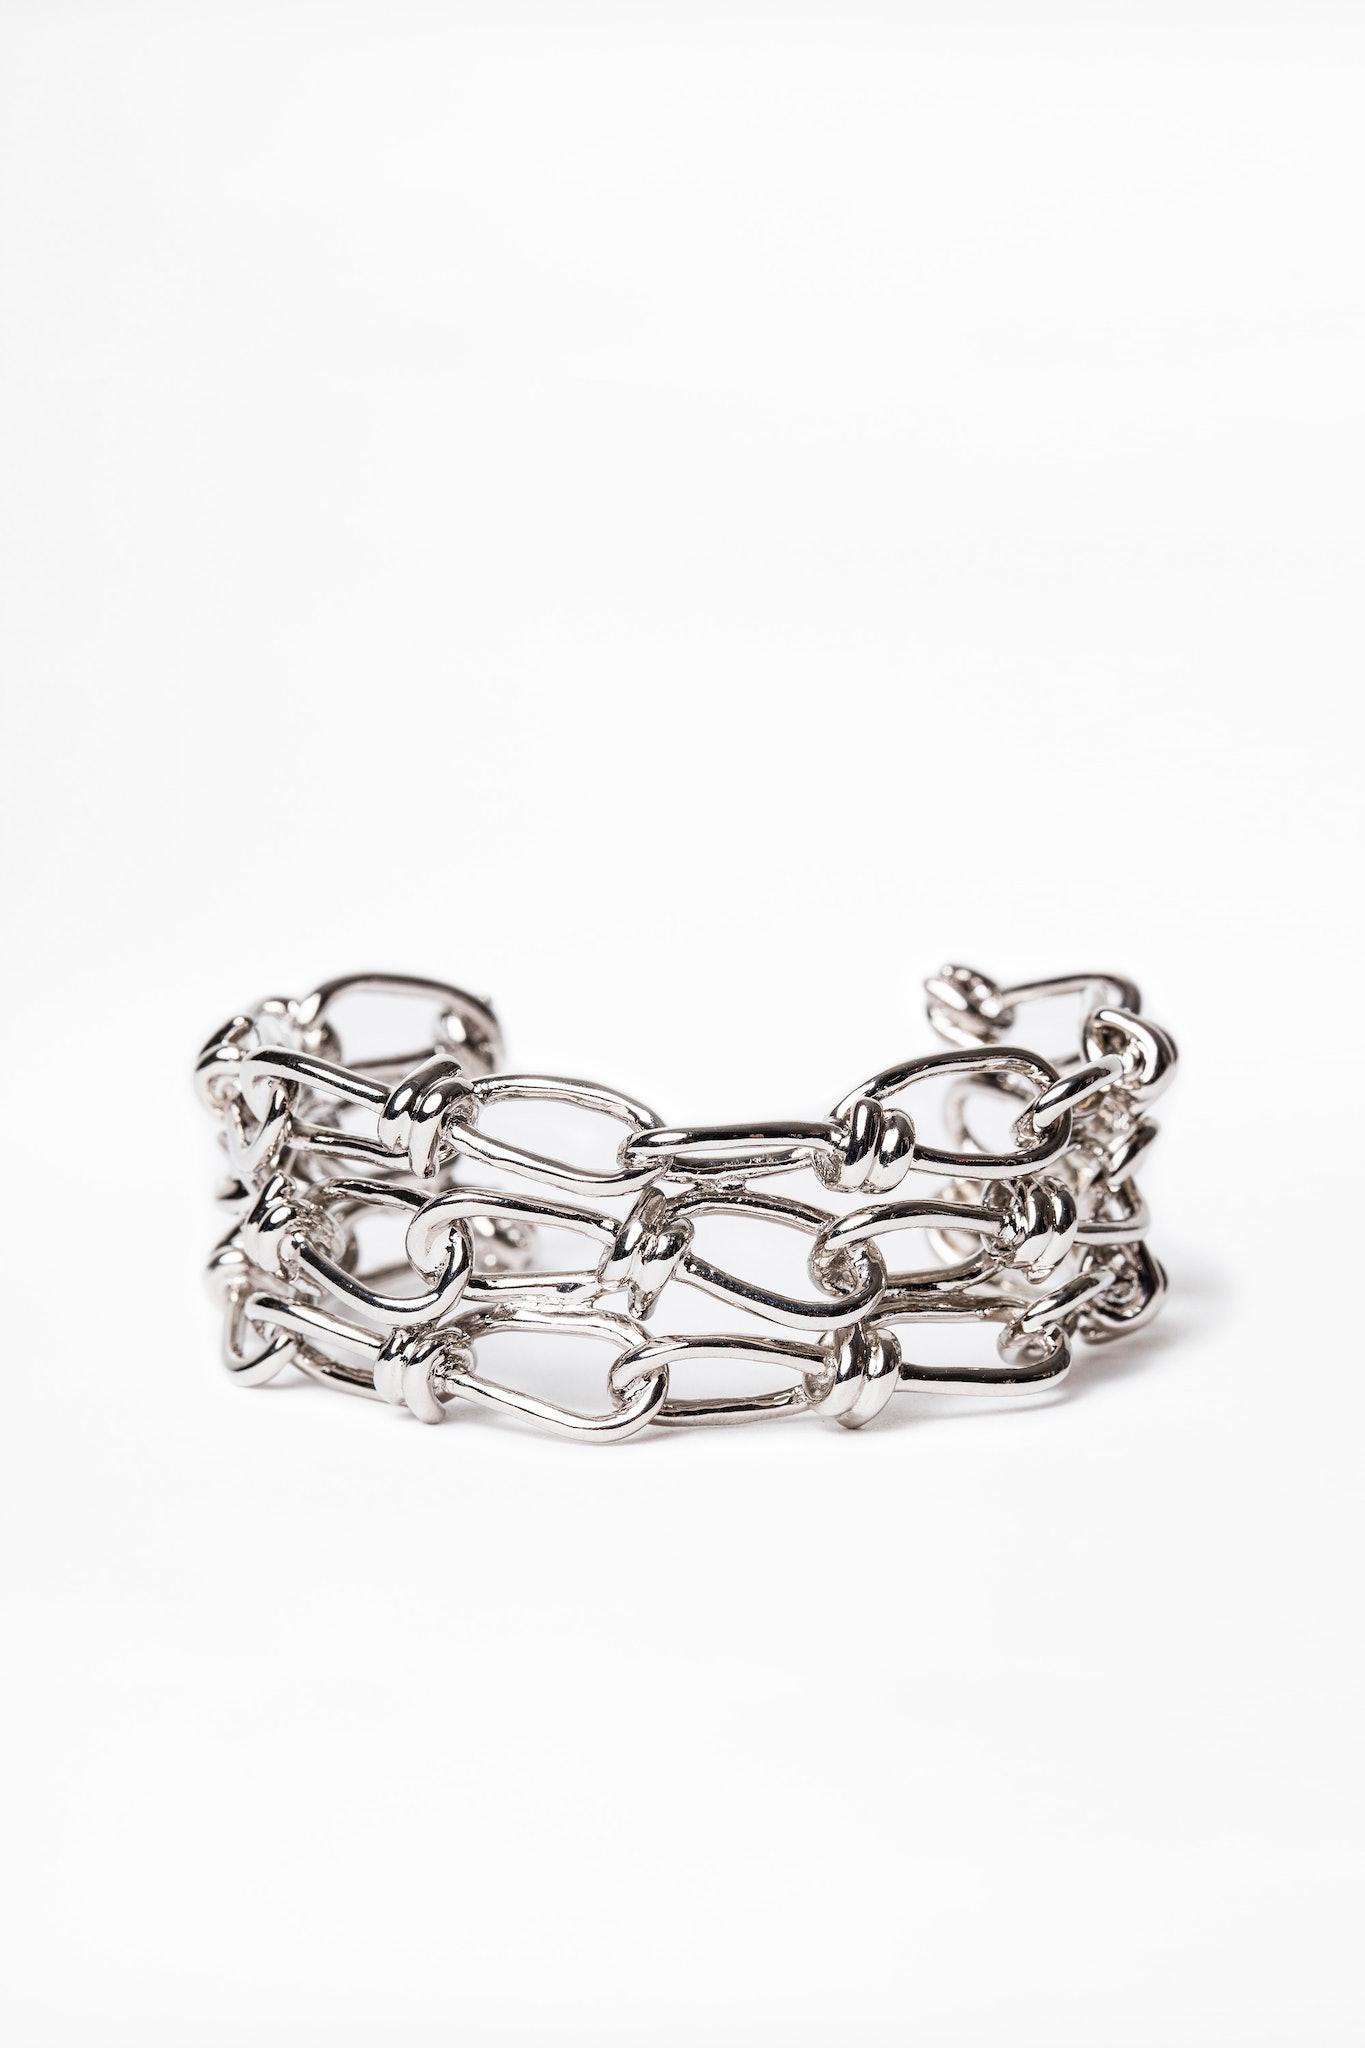 Bracelet Zadig & Voltaire x AnneLise Michelson